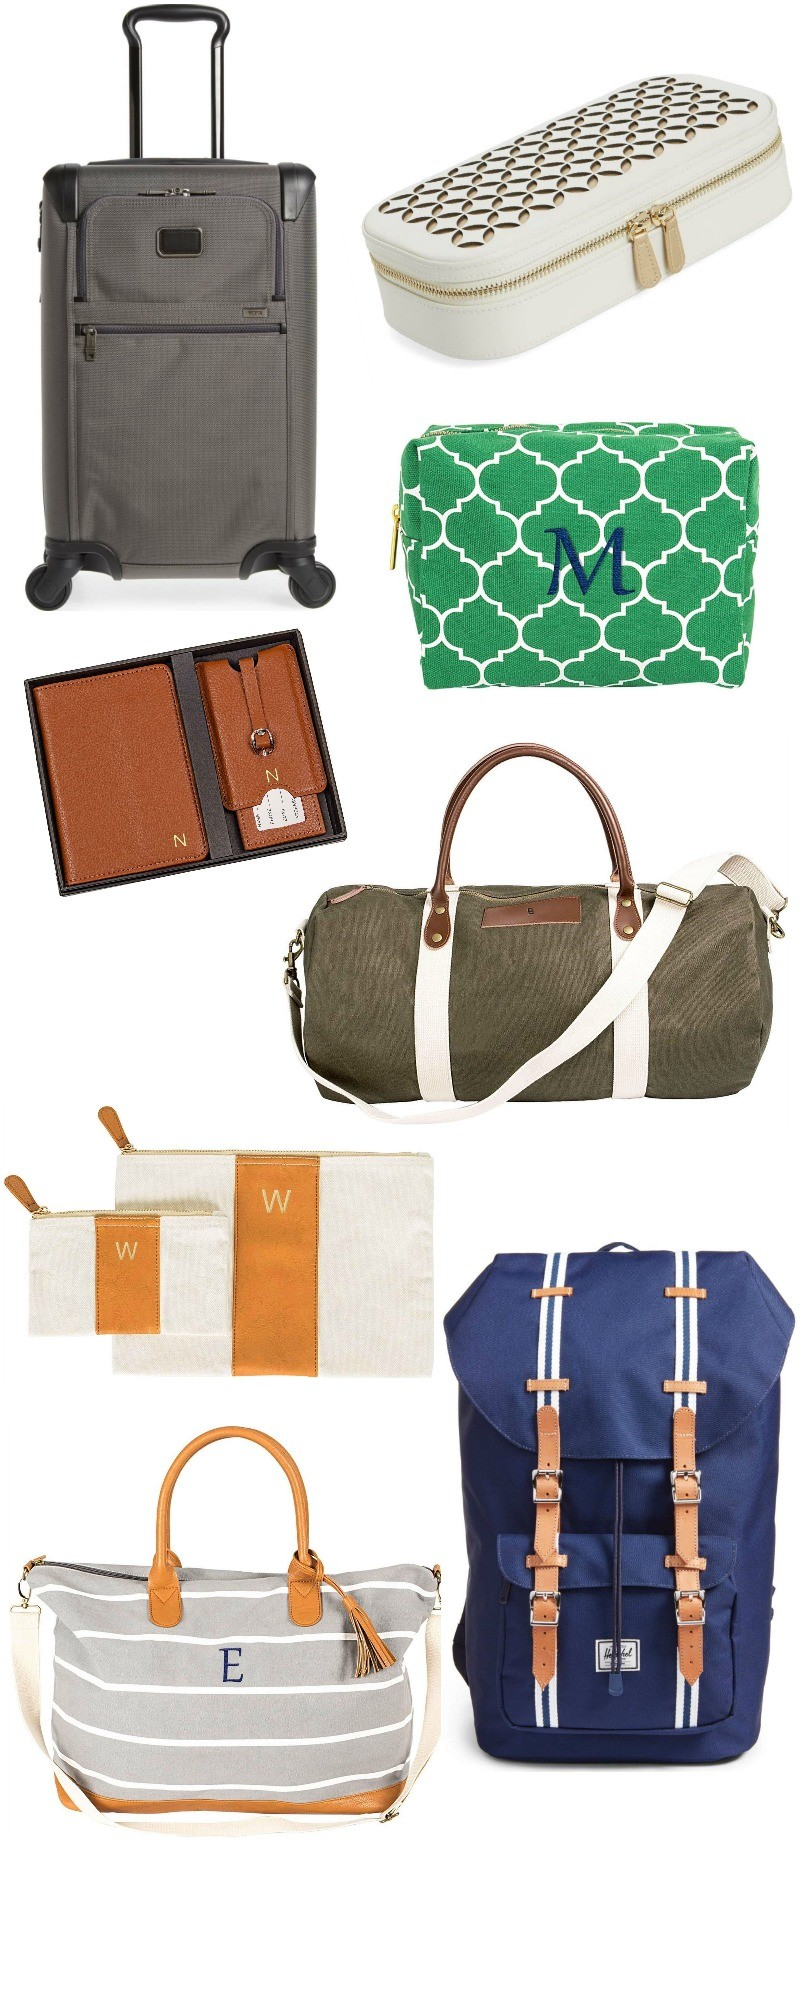 e72a6795 Chloe Bag Nordstrom Sale